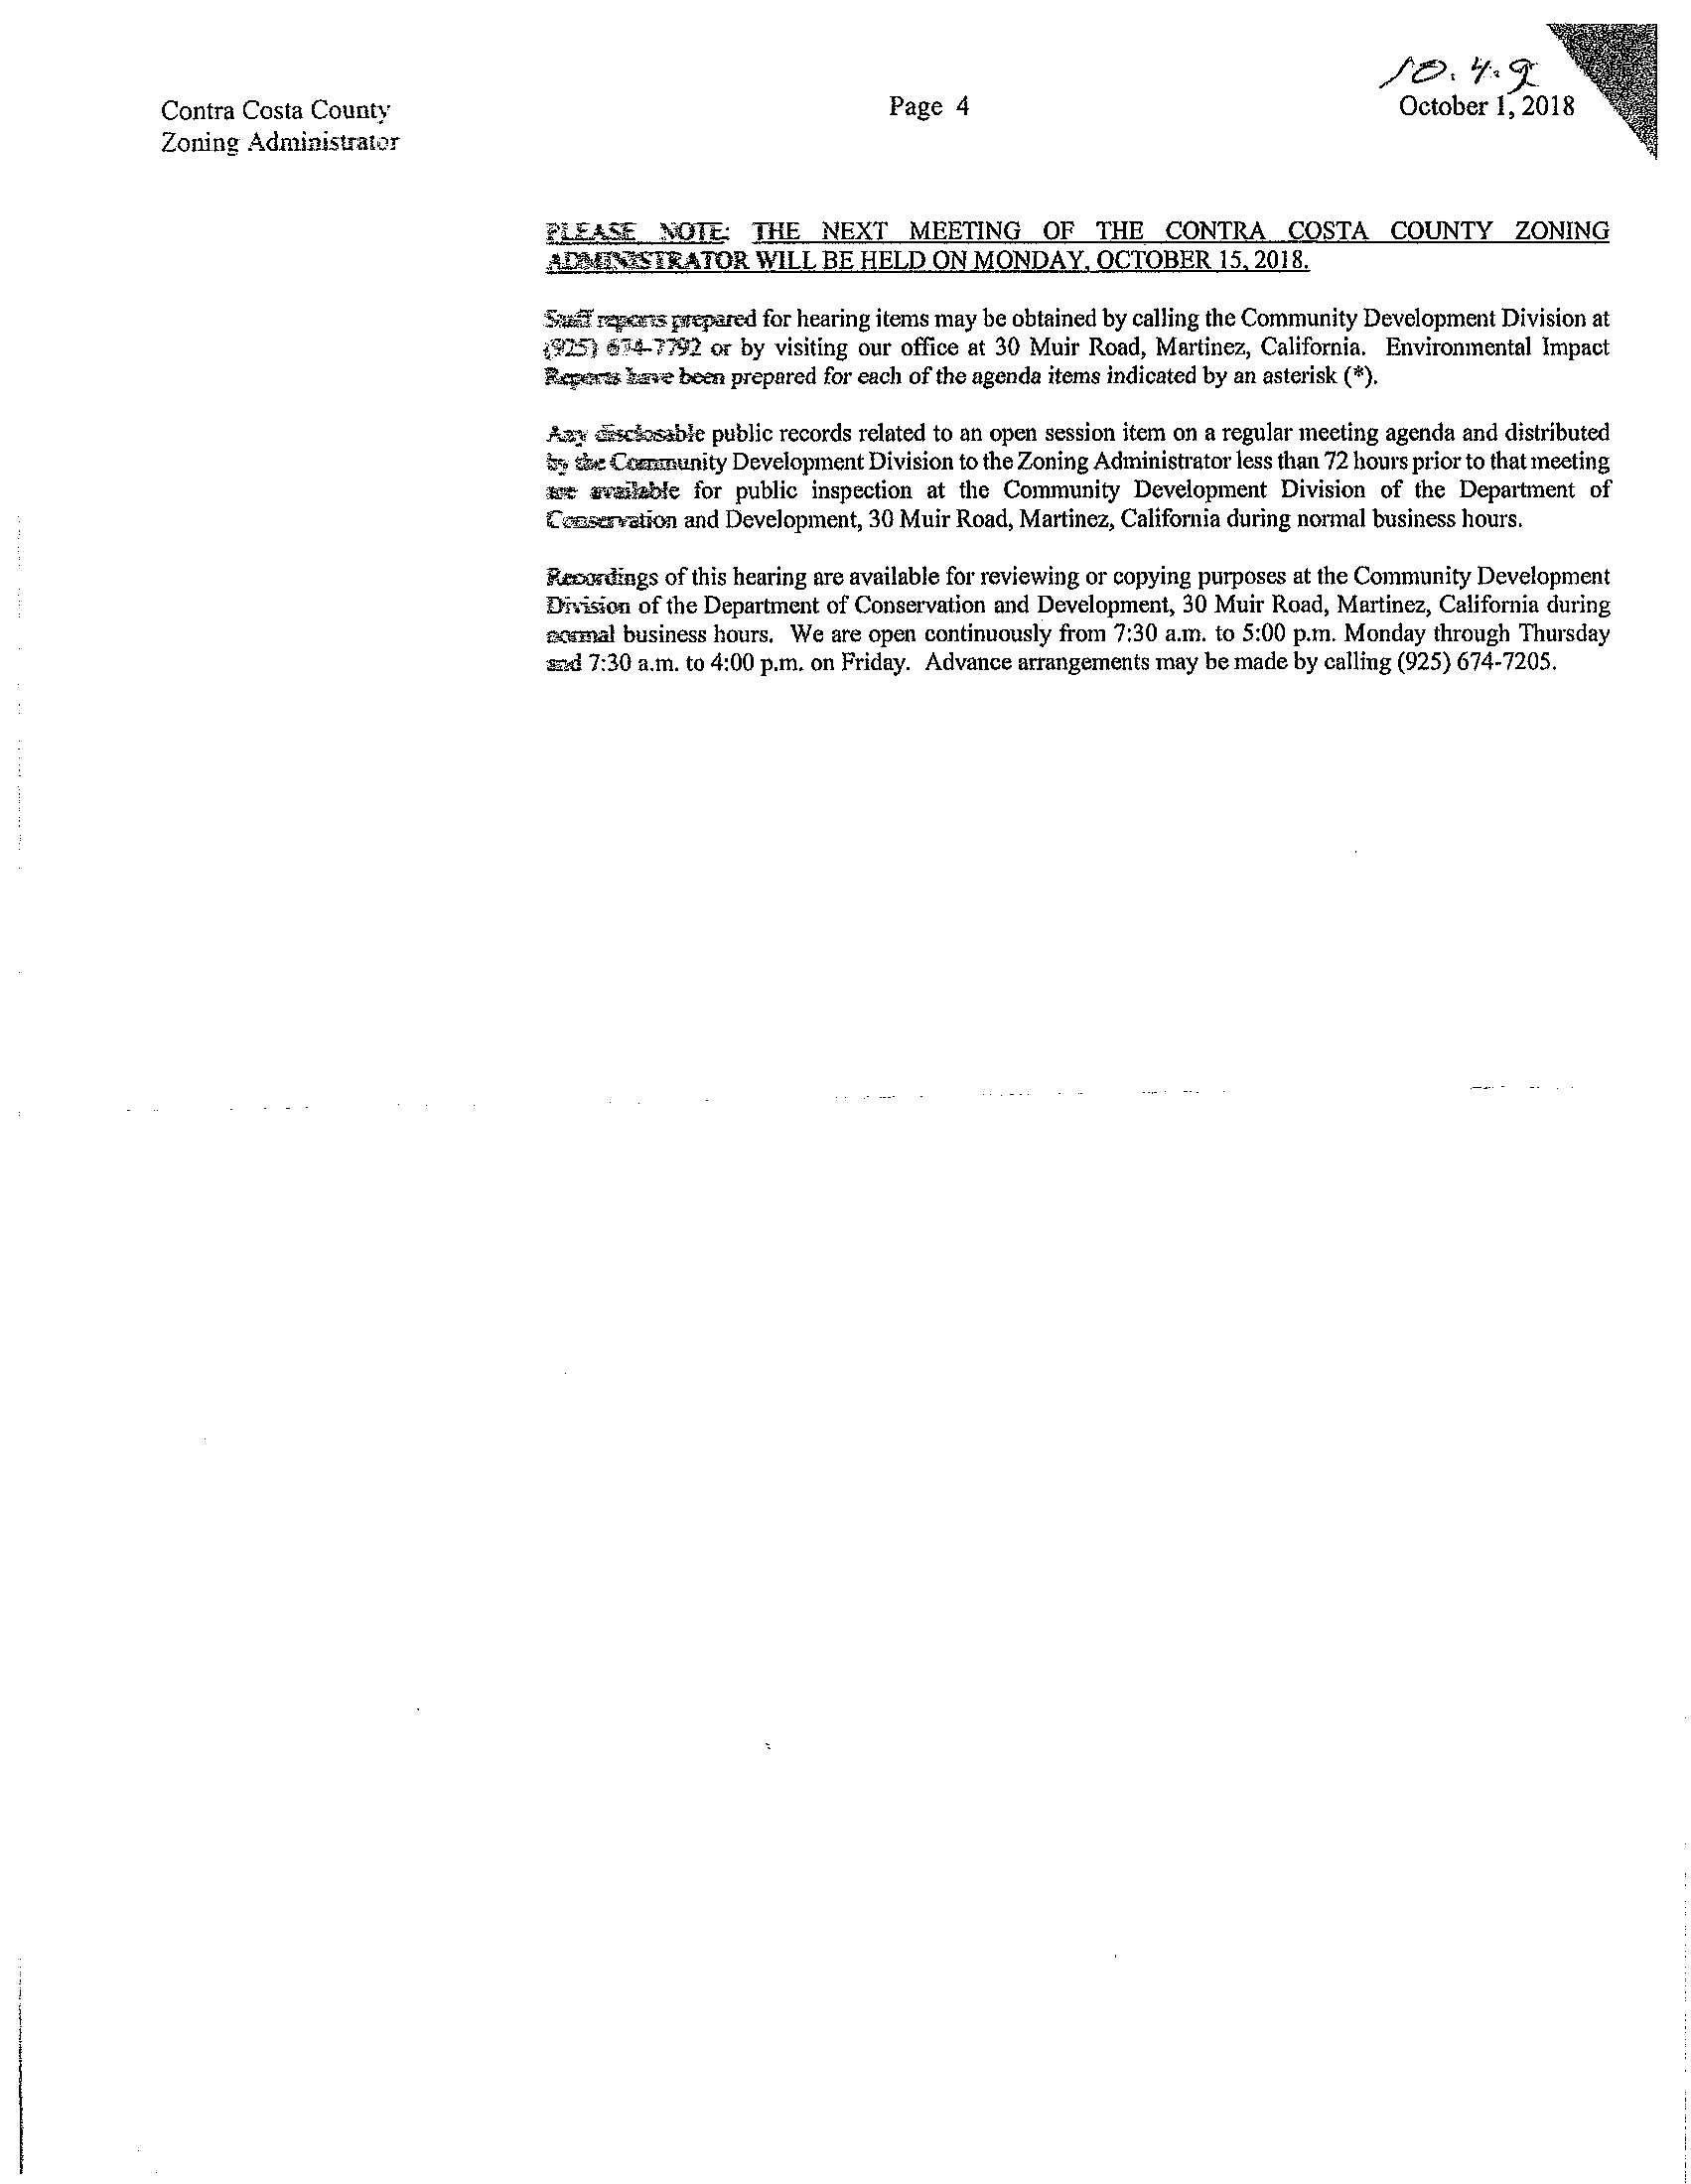 ESMAC Agenda 10.10.2018 (32 Pages)_32.jpg